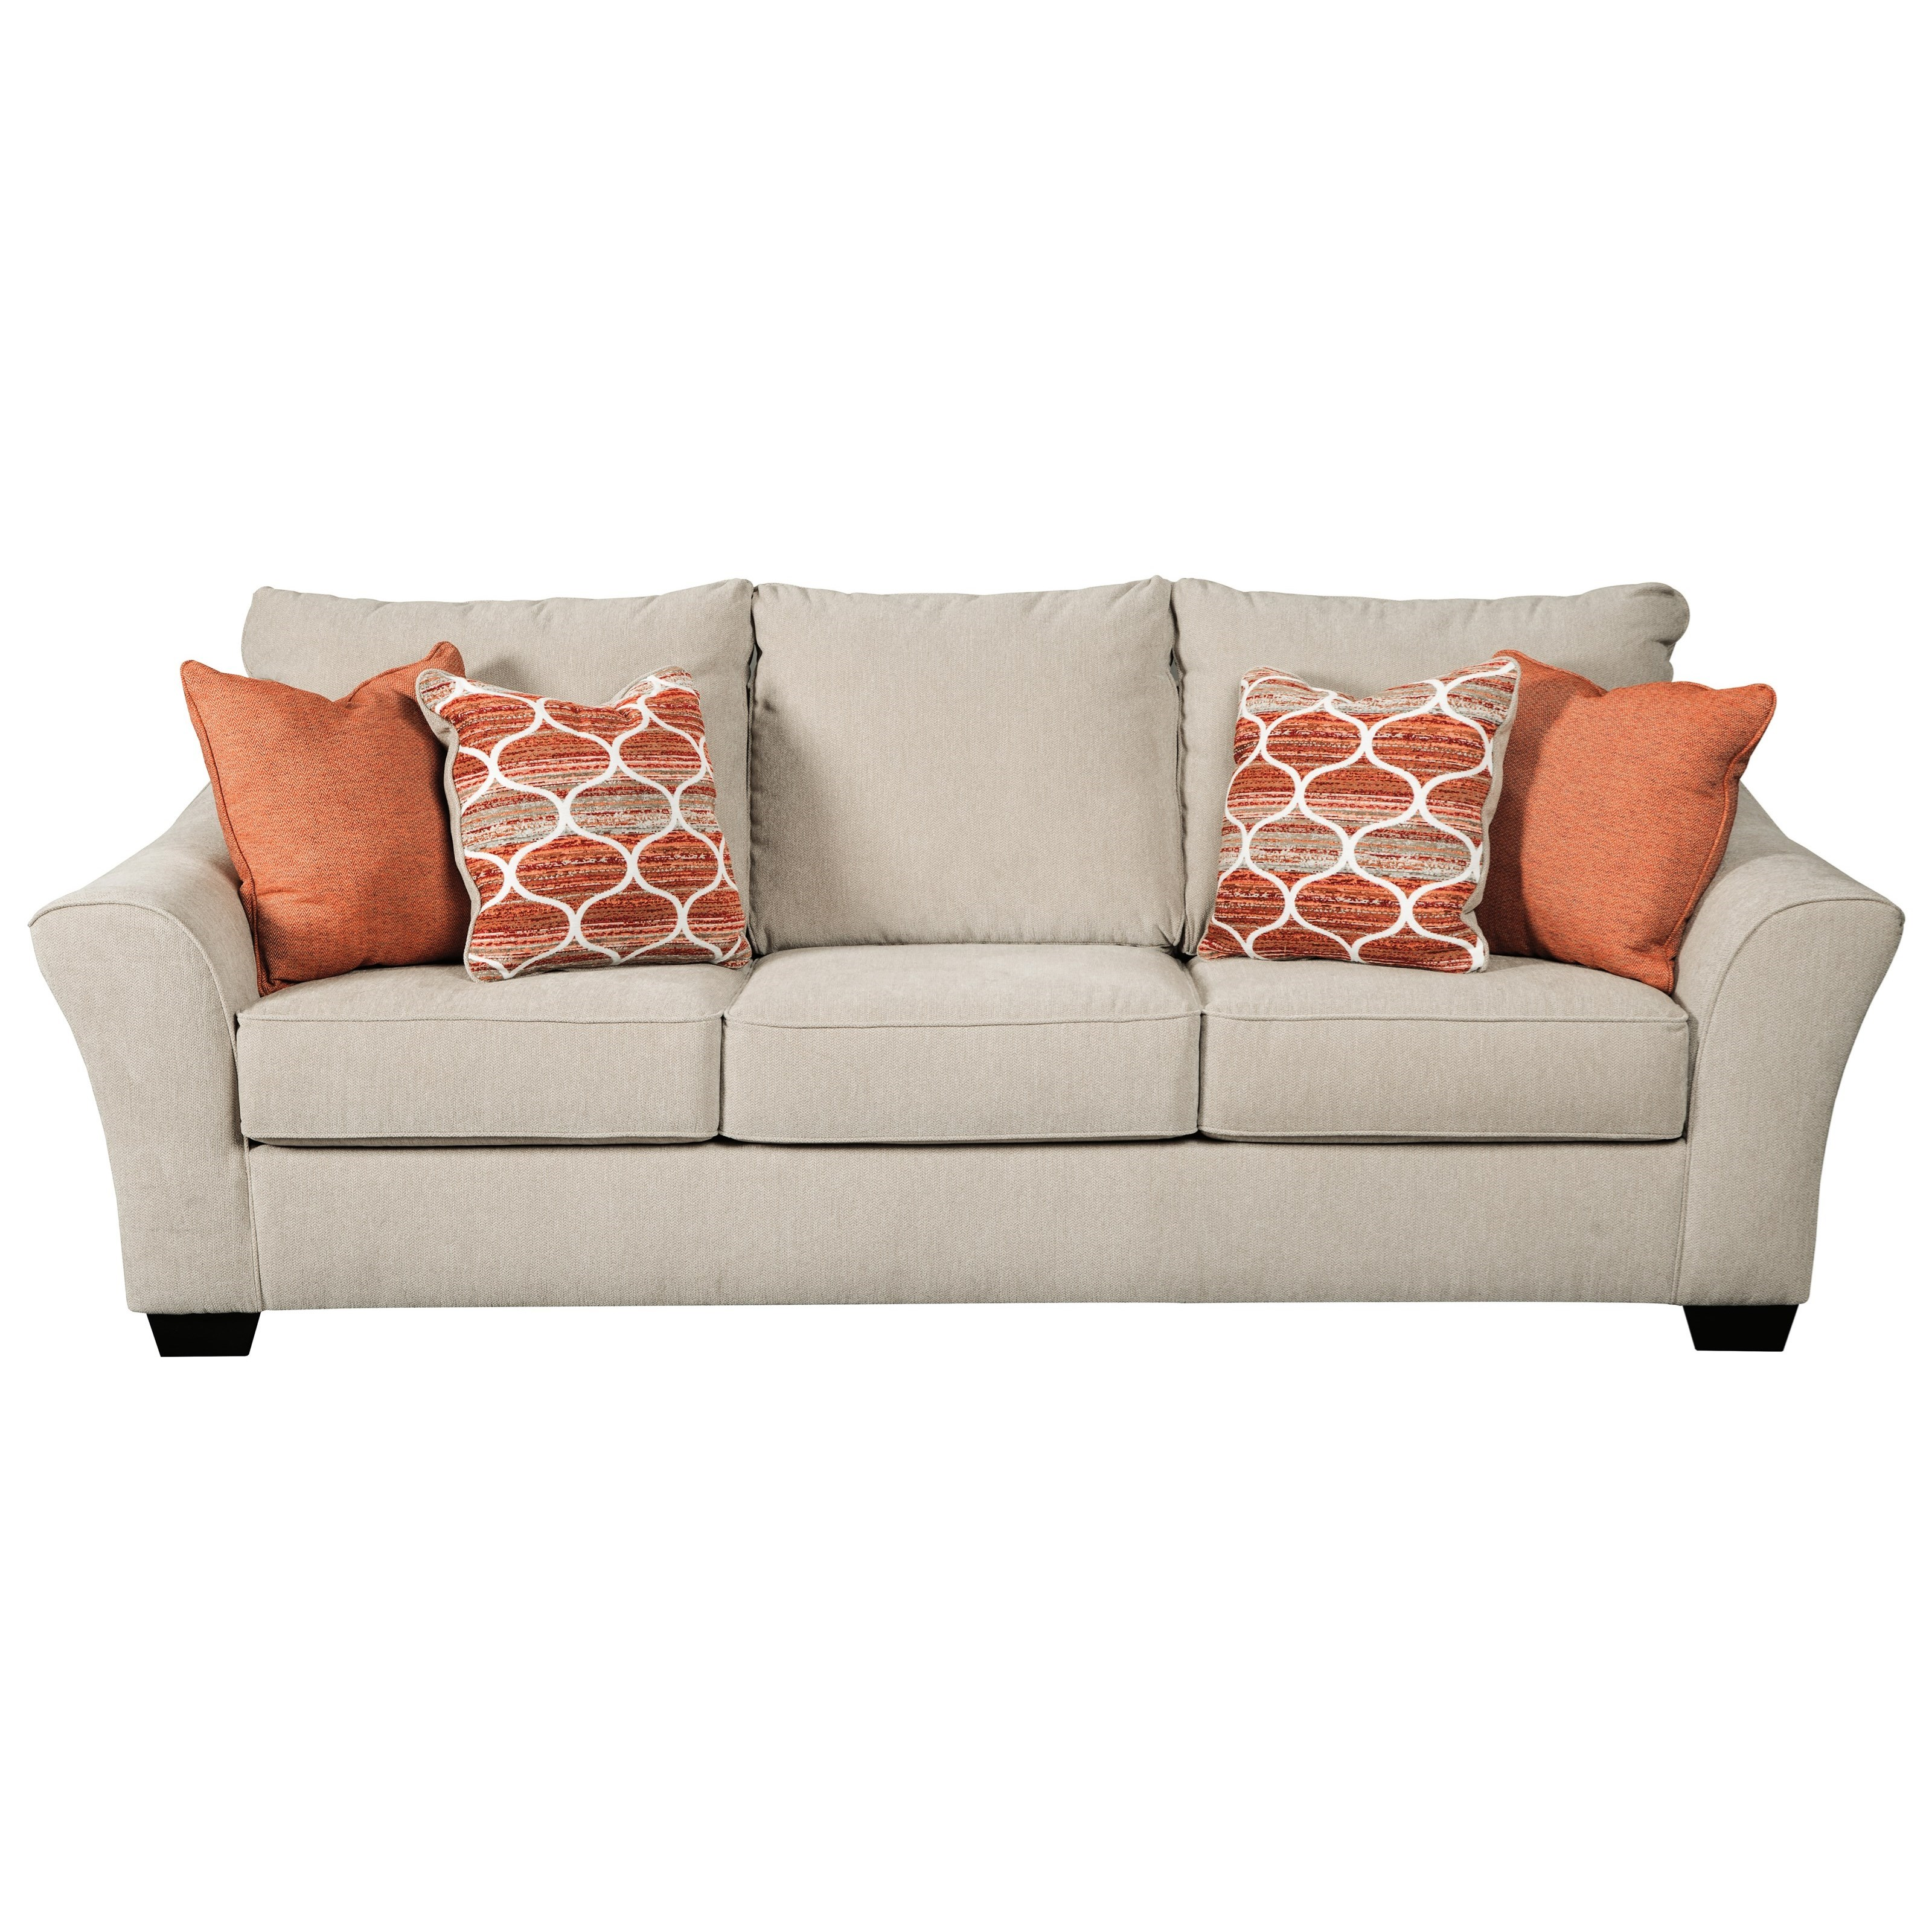 Benchcraft Lisle Nuvella Sofa - Item Number: 1120138